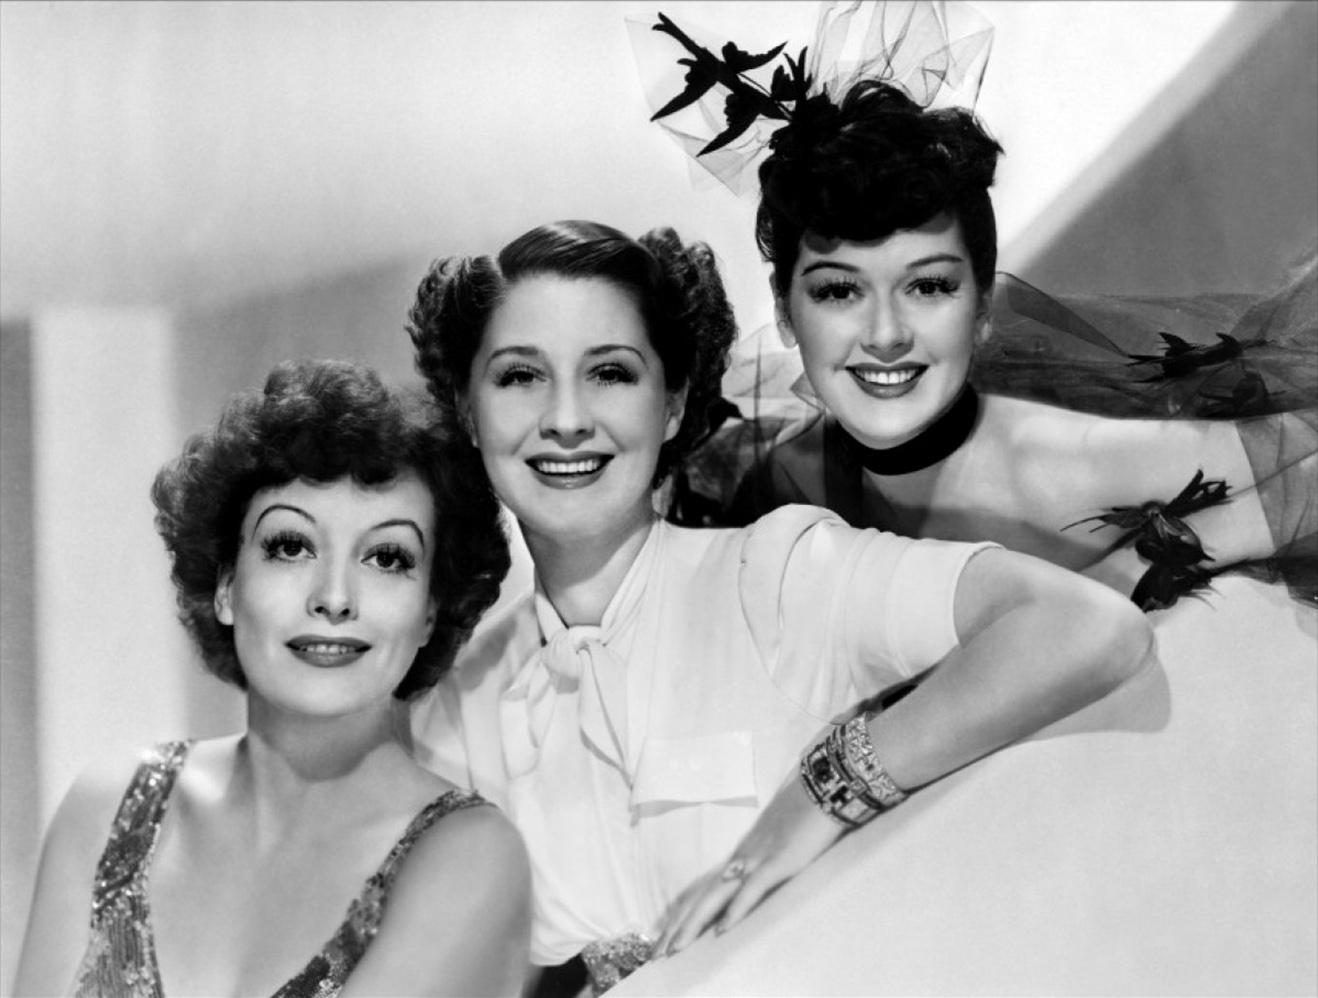 POP-UP-BEIJING-MOVIE-NIGHT-THE-WOMEN-1939-08.jpg